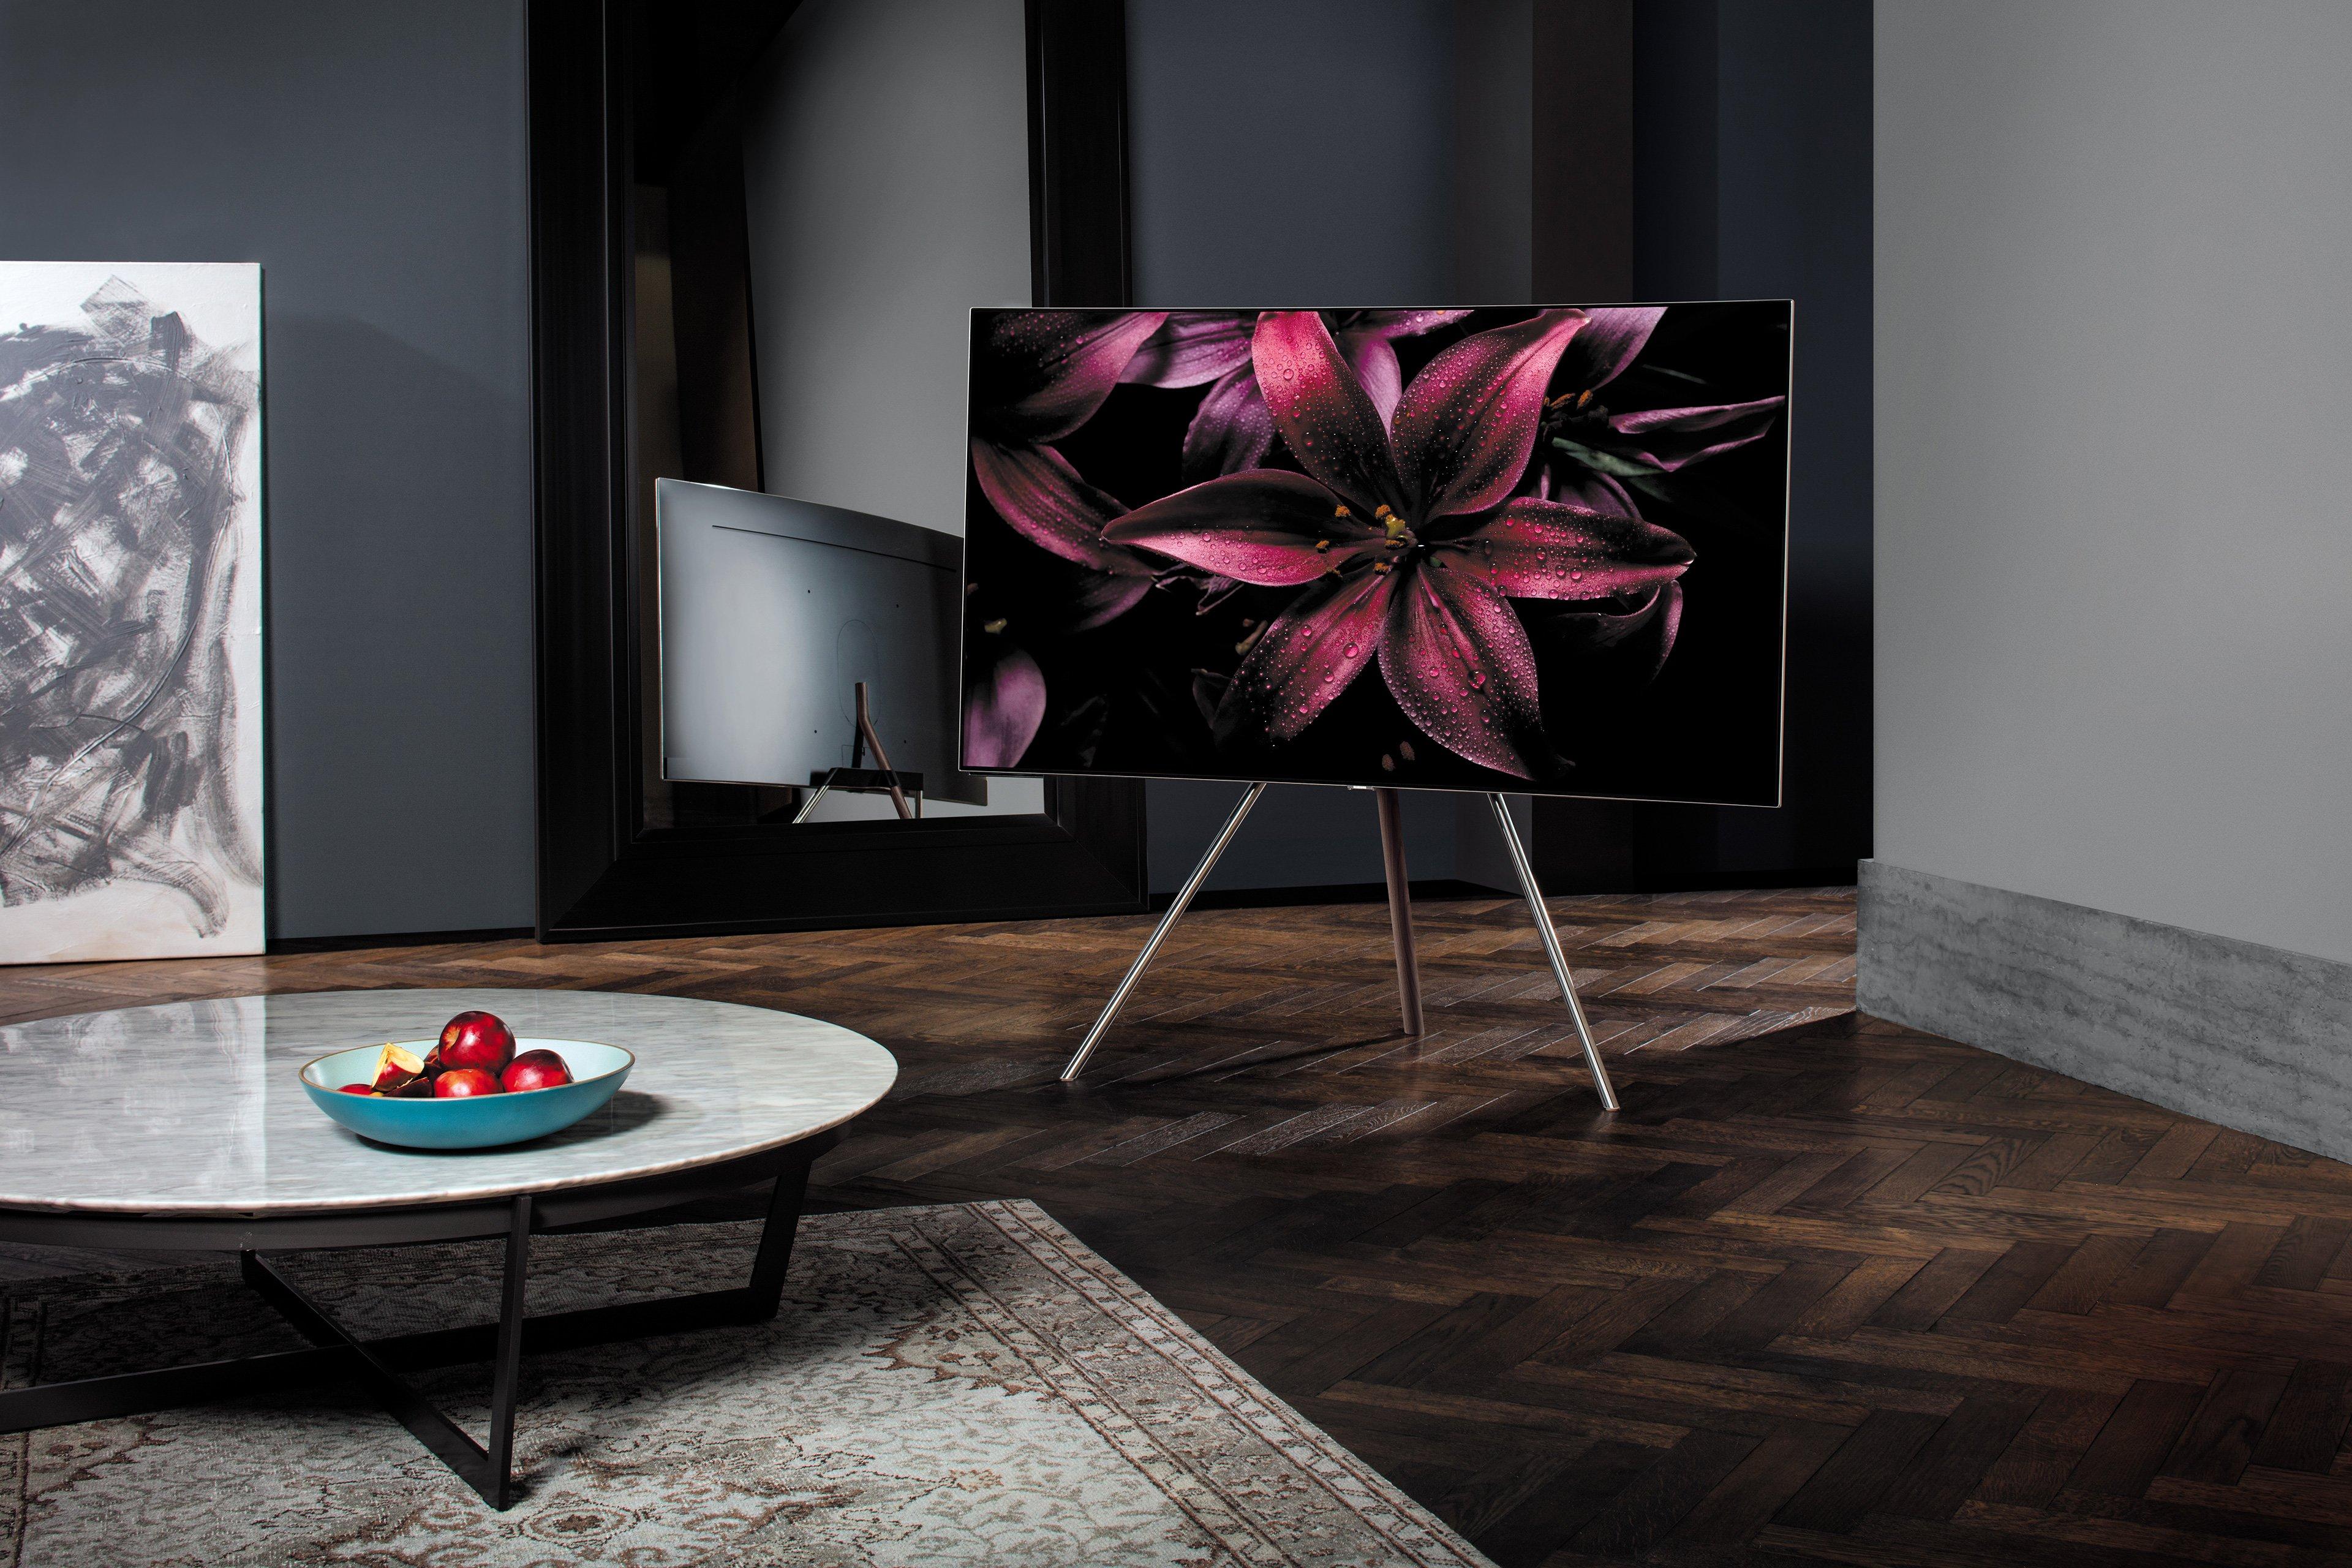 QLED - telewizor z tuningowanym panelem LCD 24